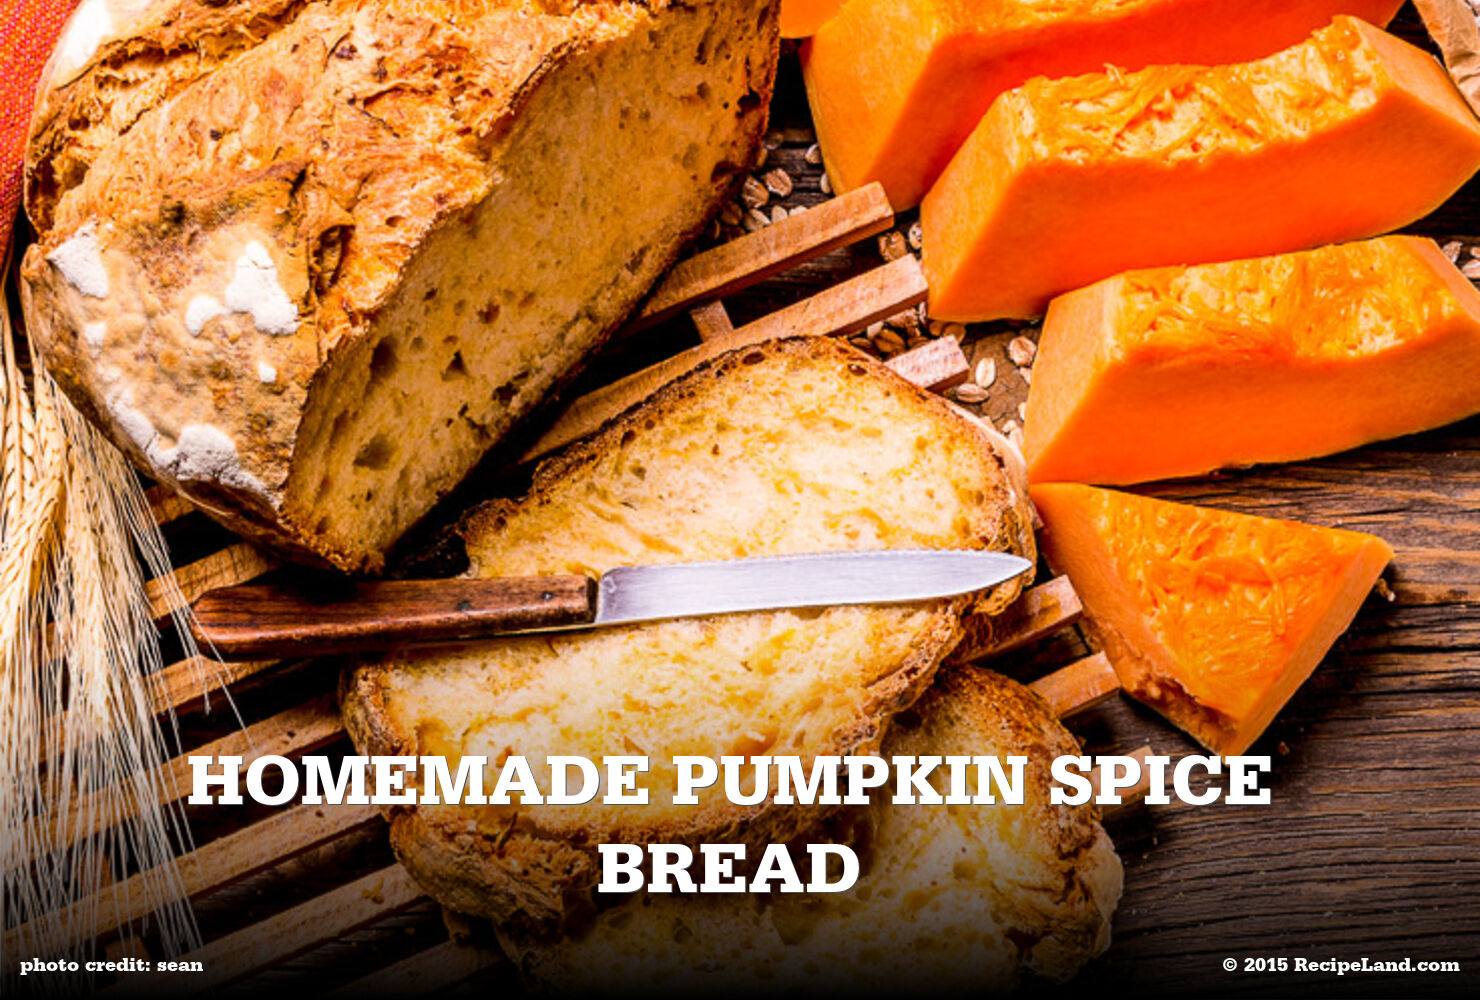 Homemade Pumpkin Spice Bread